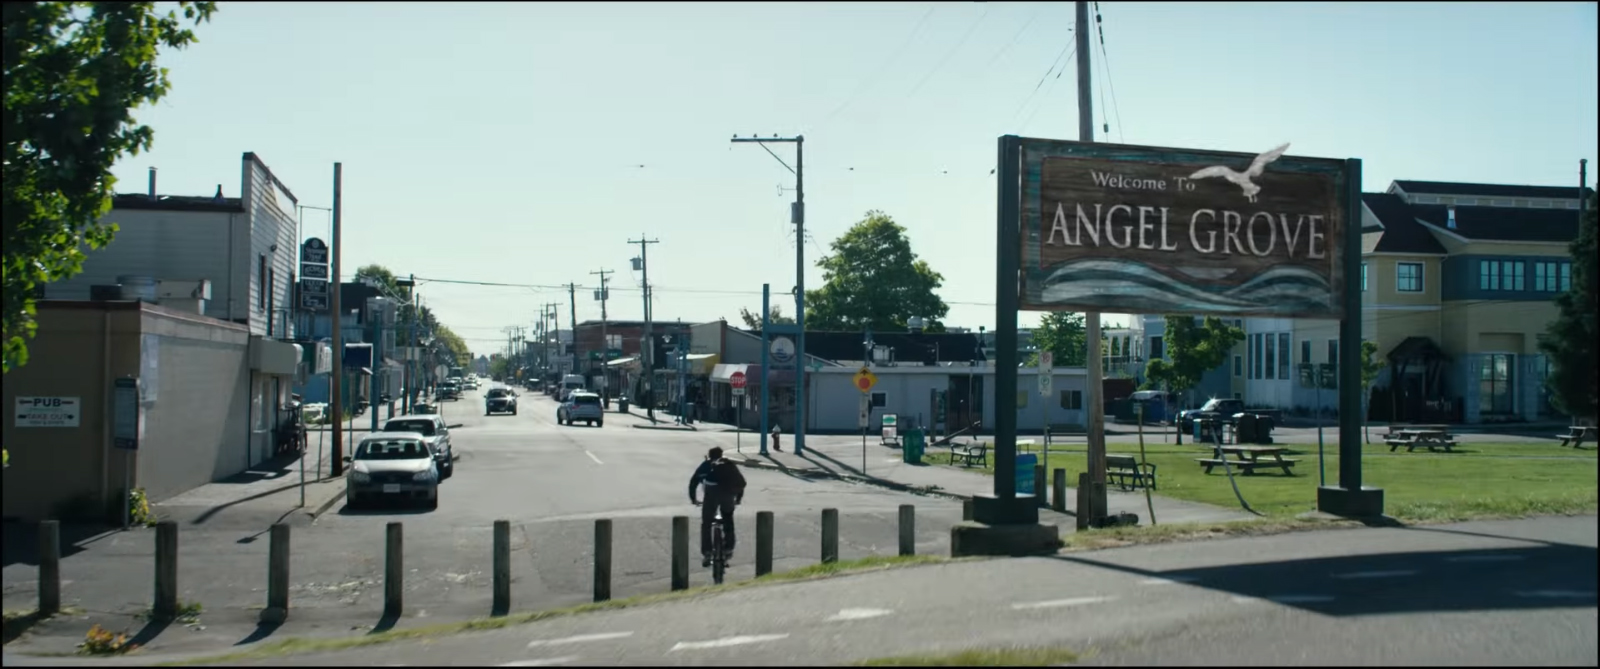 Angel Grove.jpg